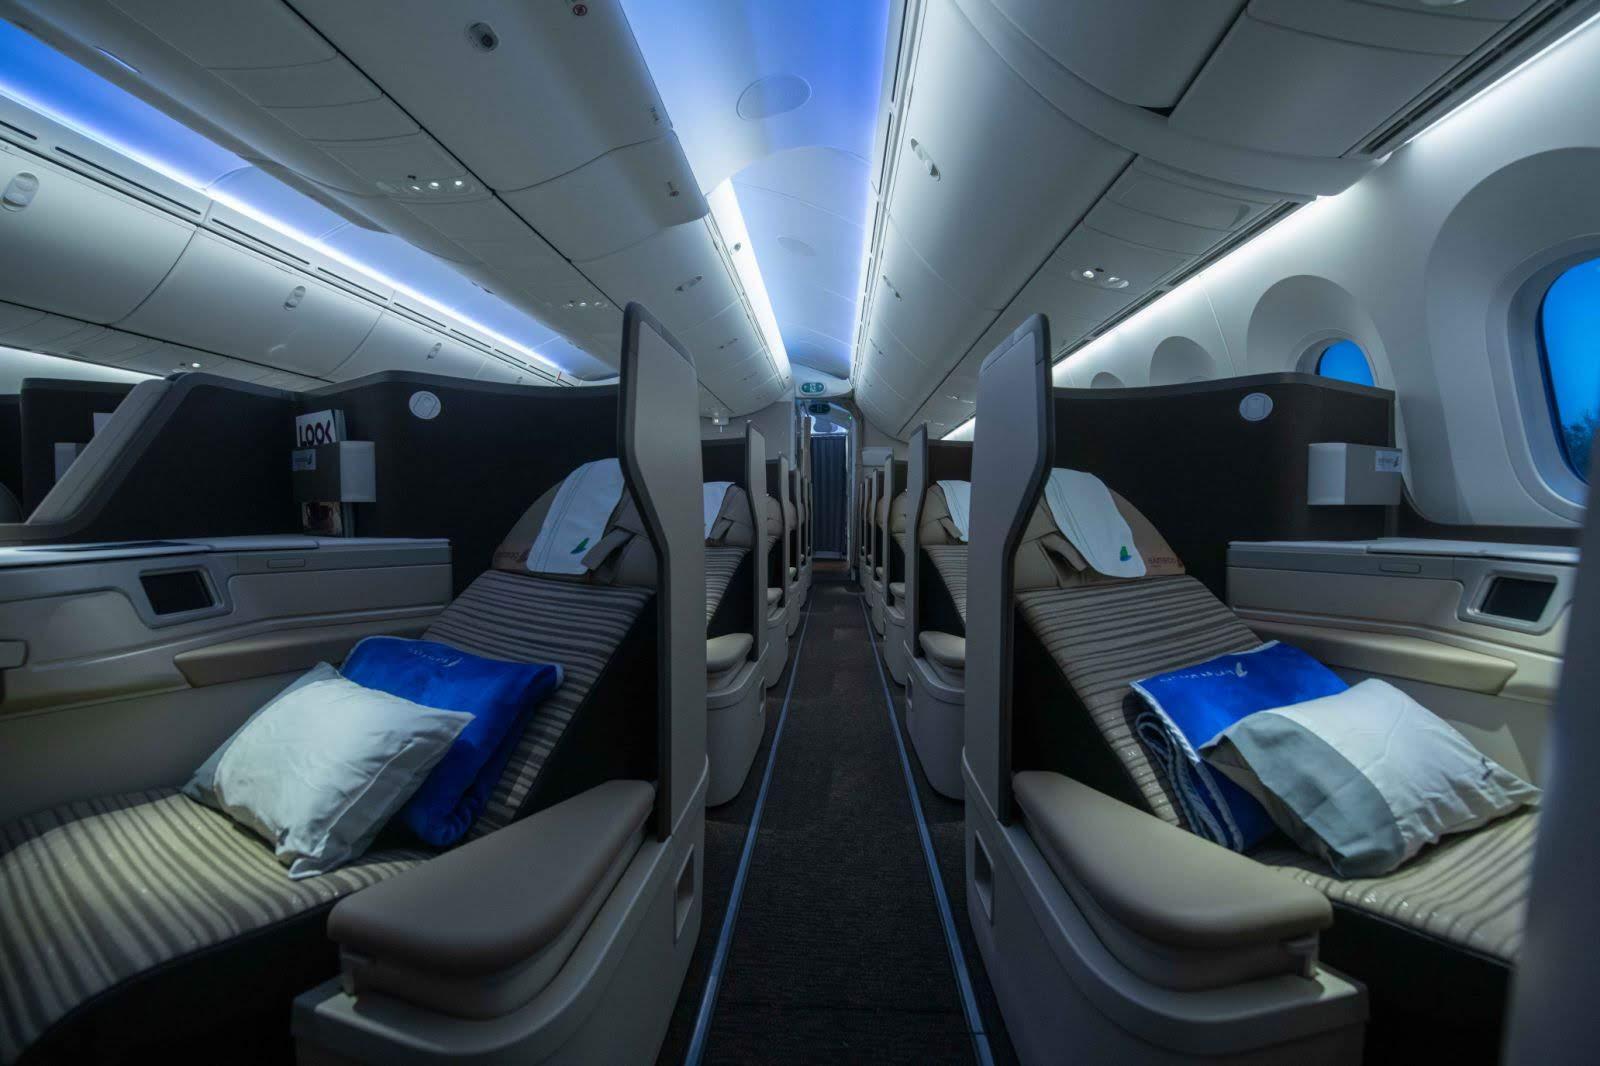 Bamboo Airways sẽ khai thác 4 máy bay Boeing 787-9 Dreamliner 3